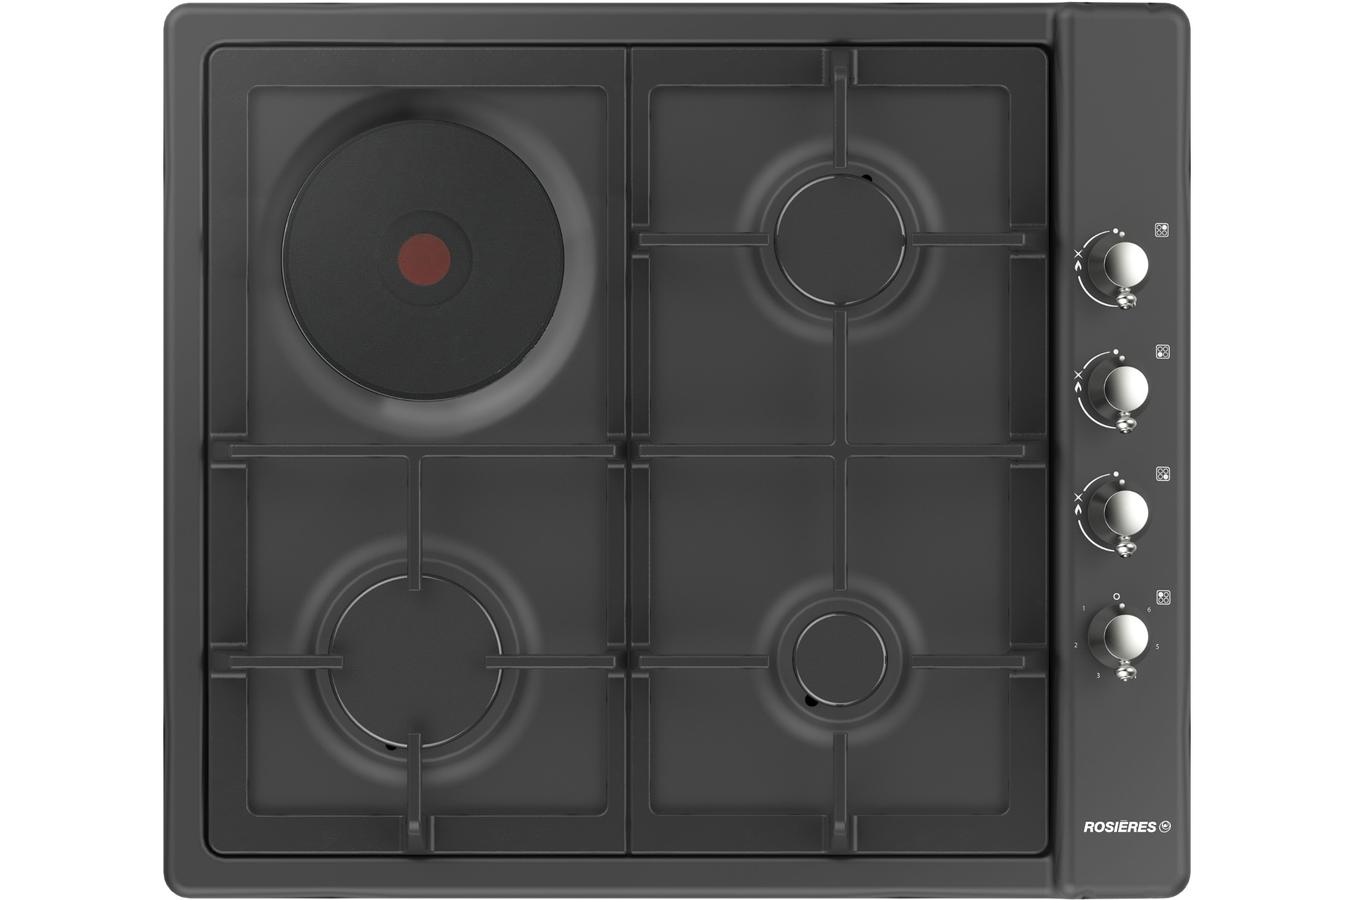 plaque mixte rosieres rtt631fcav 4275942 darty. Black Bedroom Furniture Sets. Home Design Ideas